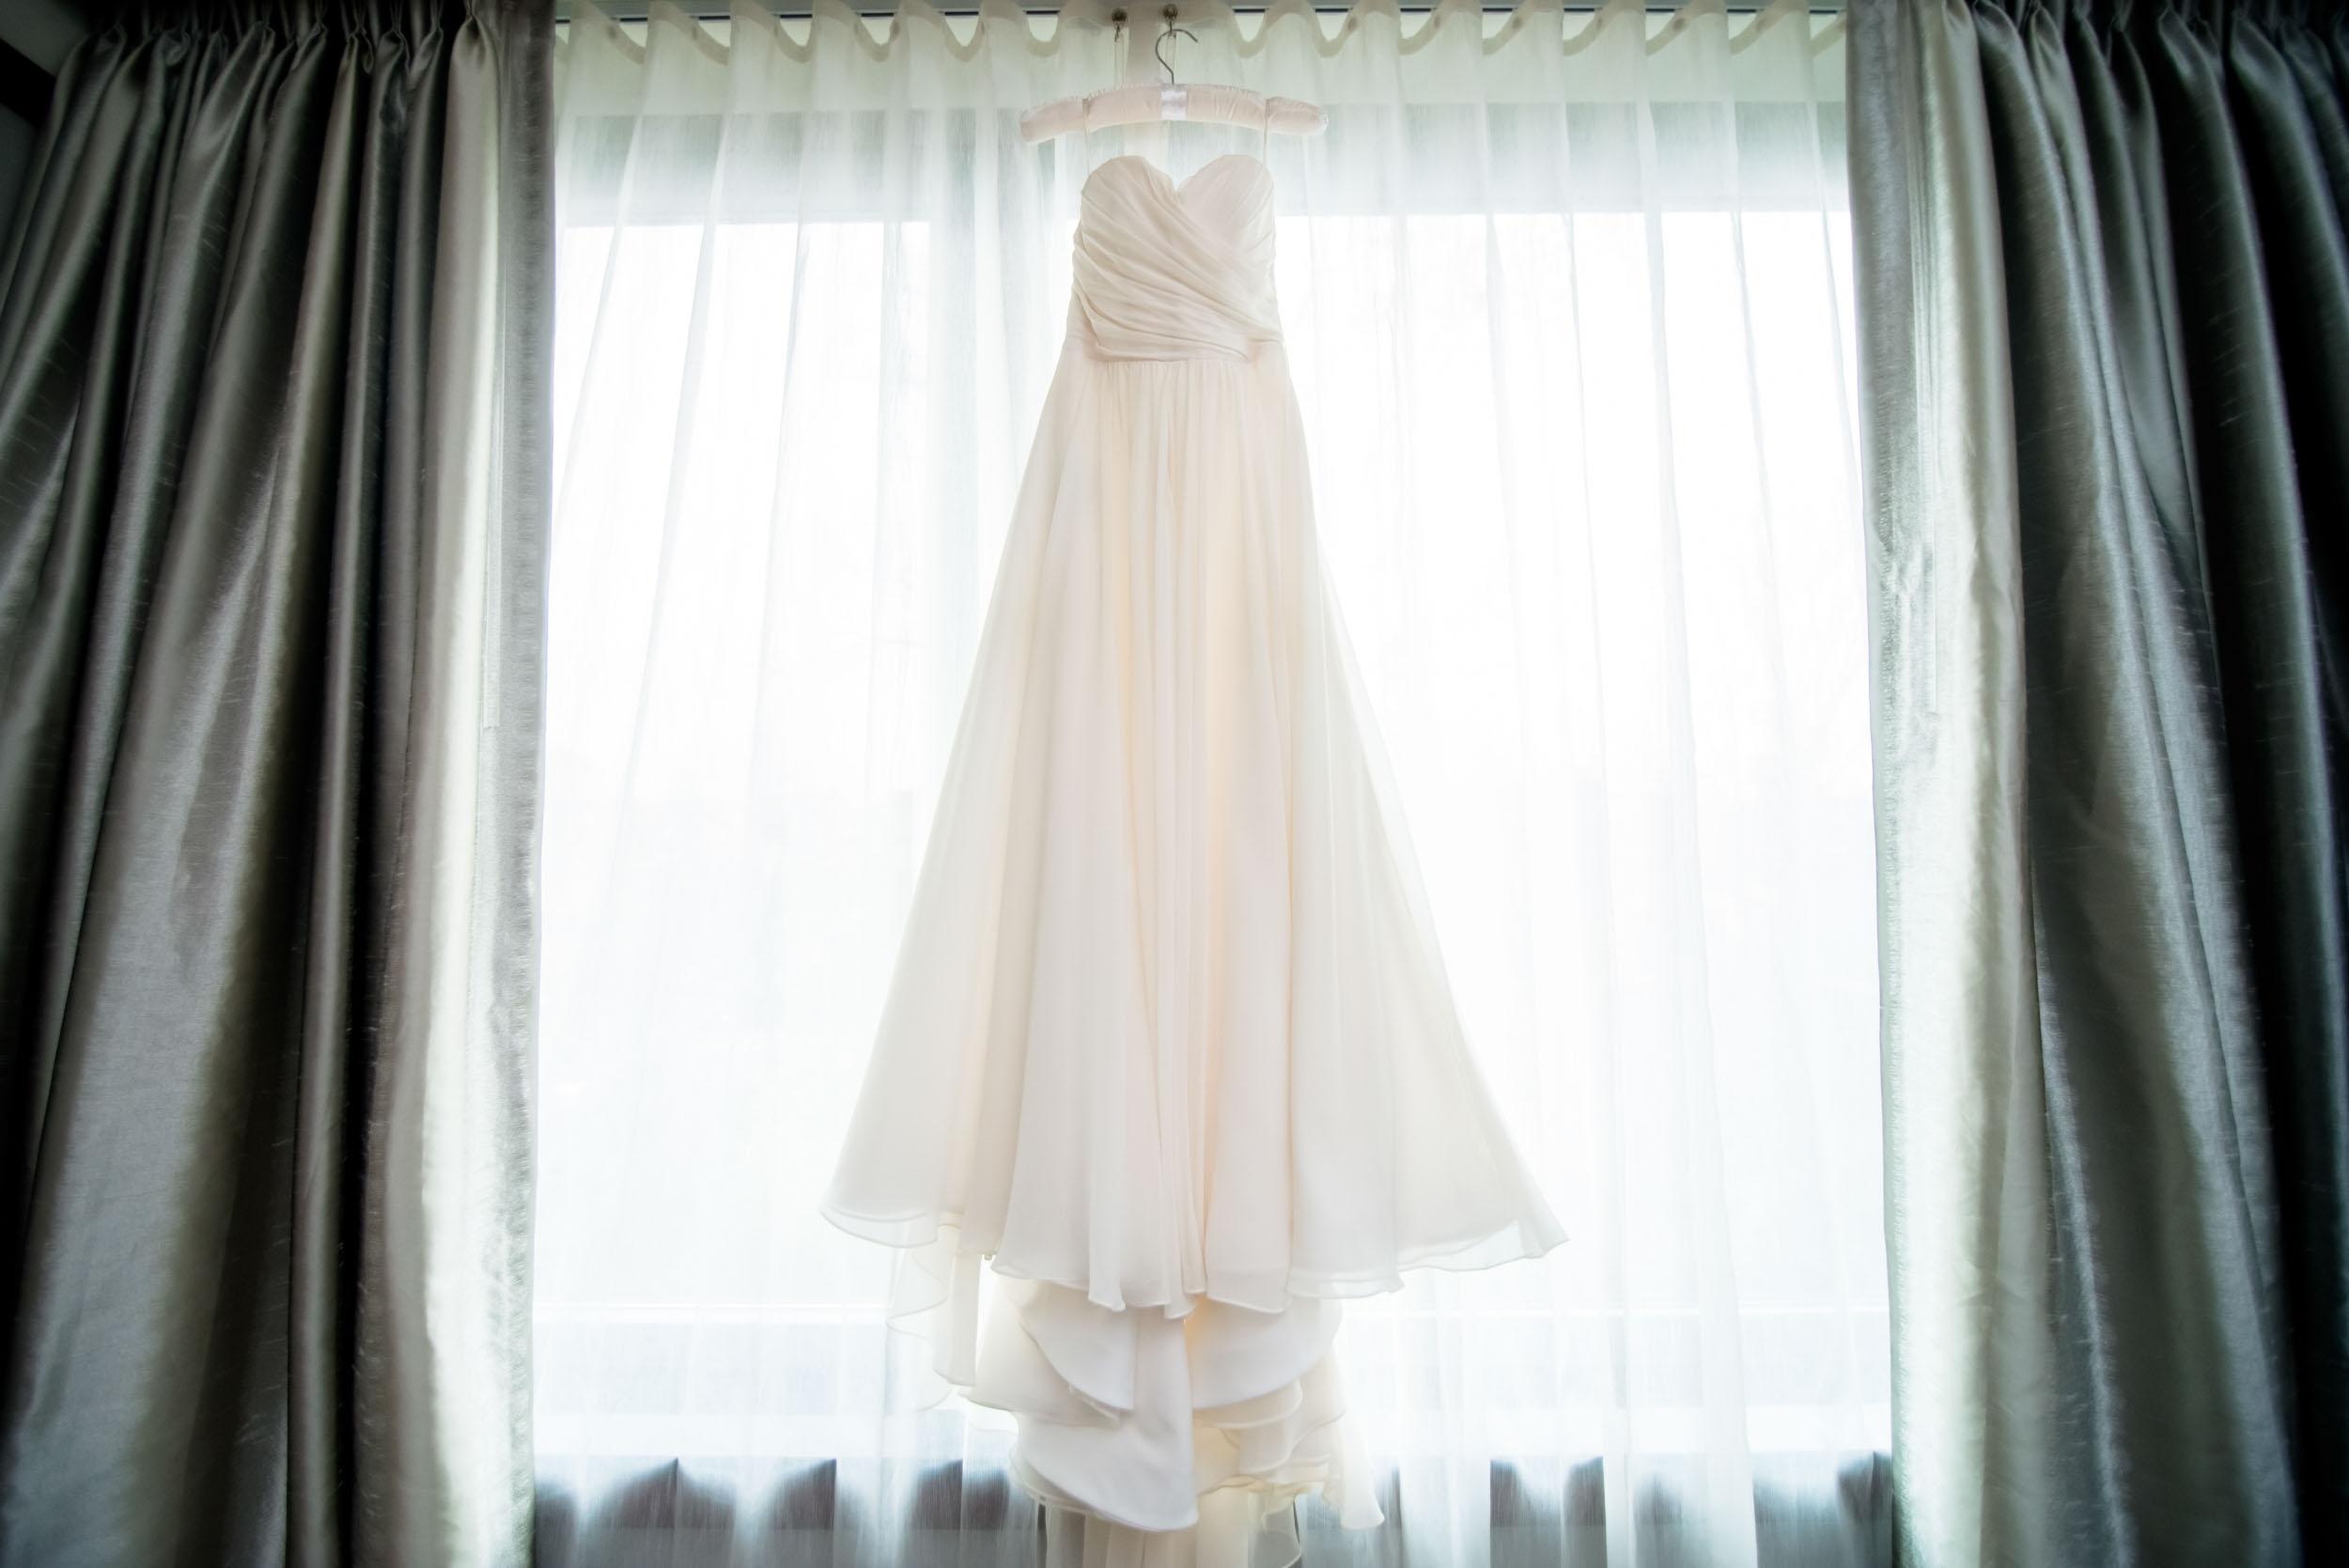 dc+metro+wedding+photographer+vadym+guliuk+photography+weddings+dress-2020.jpg